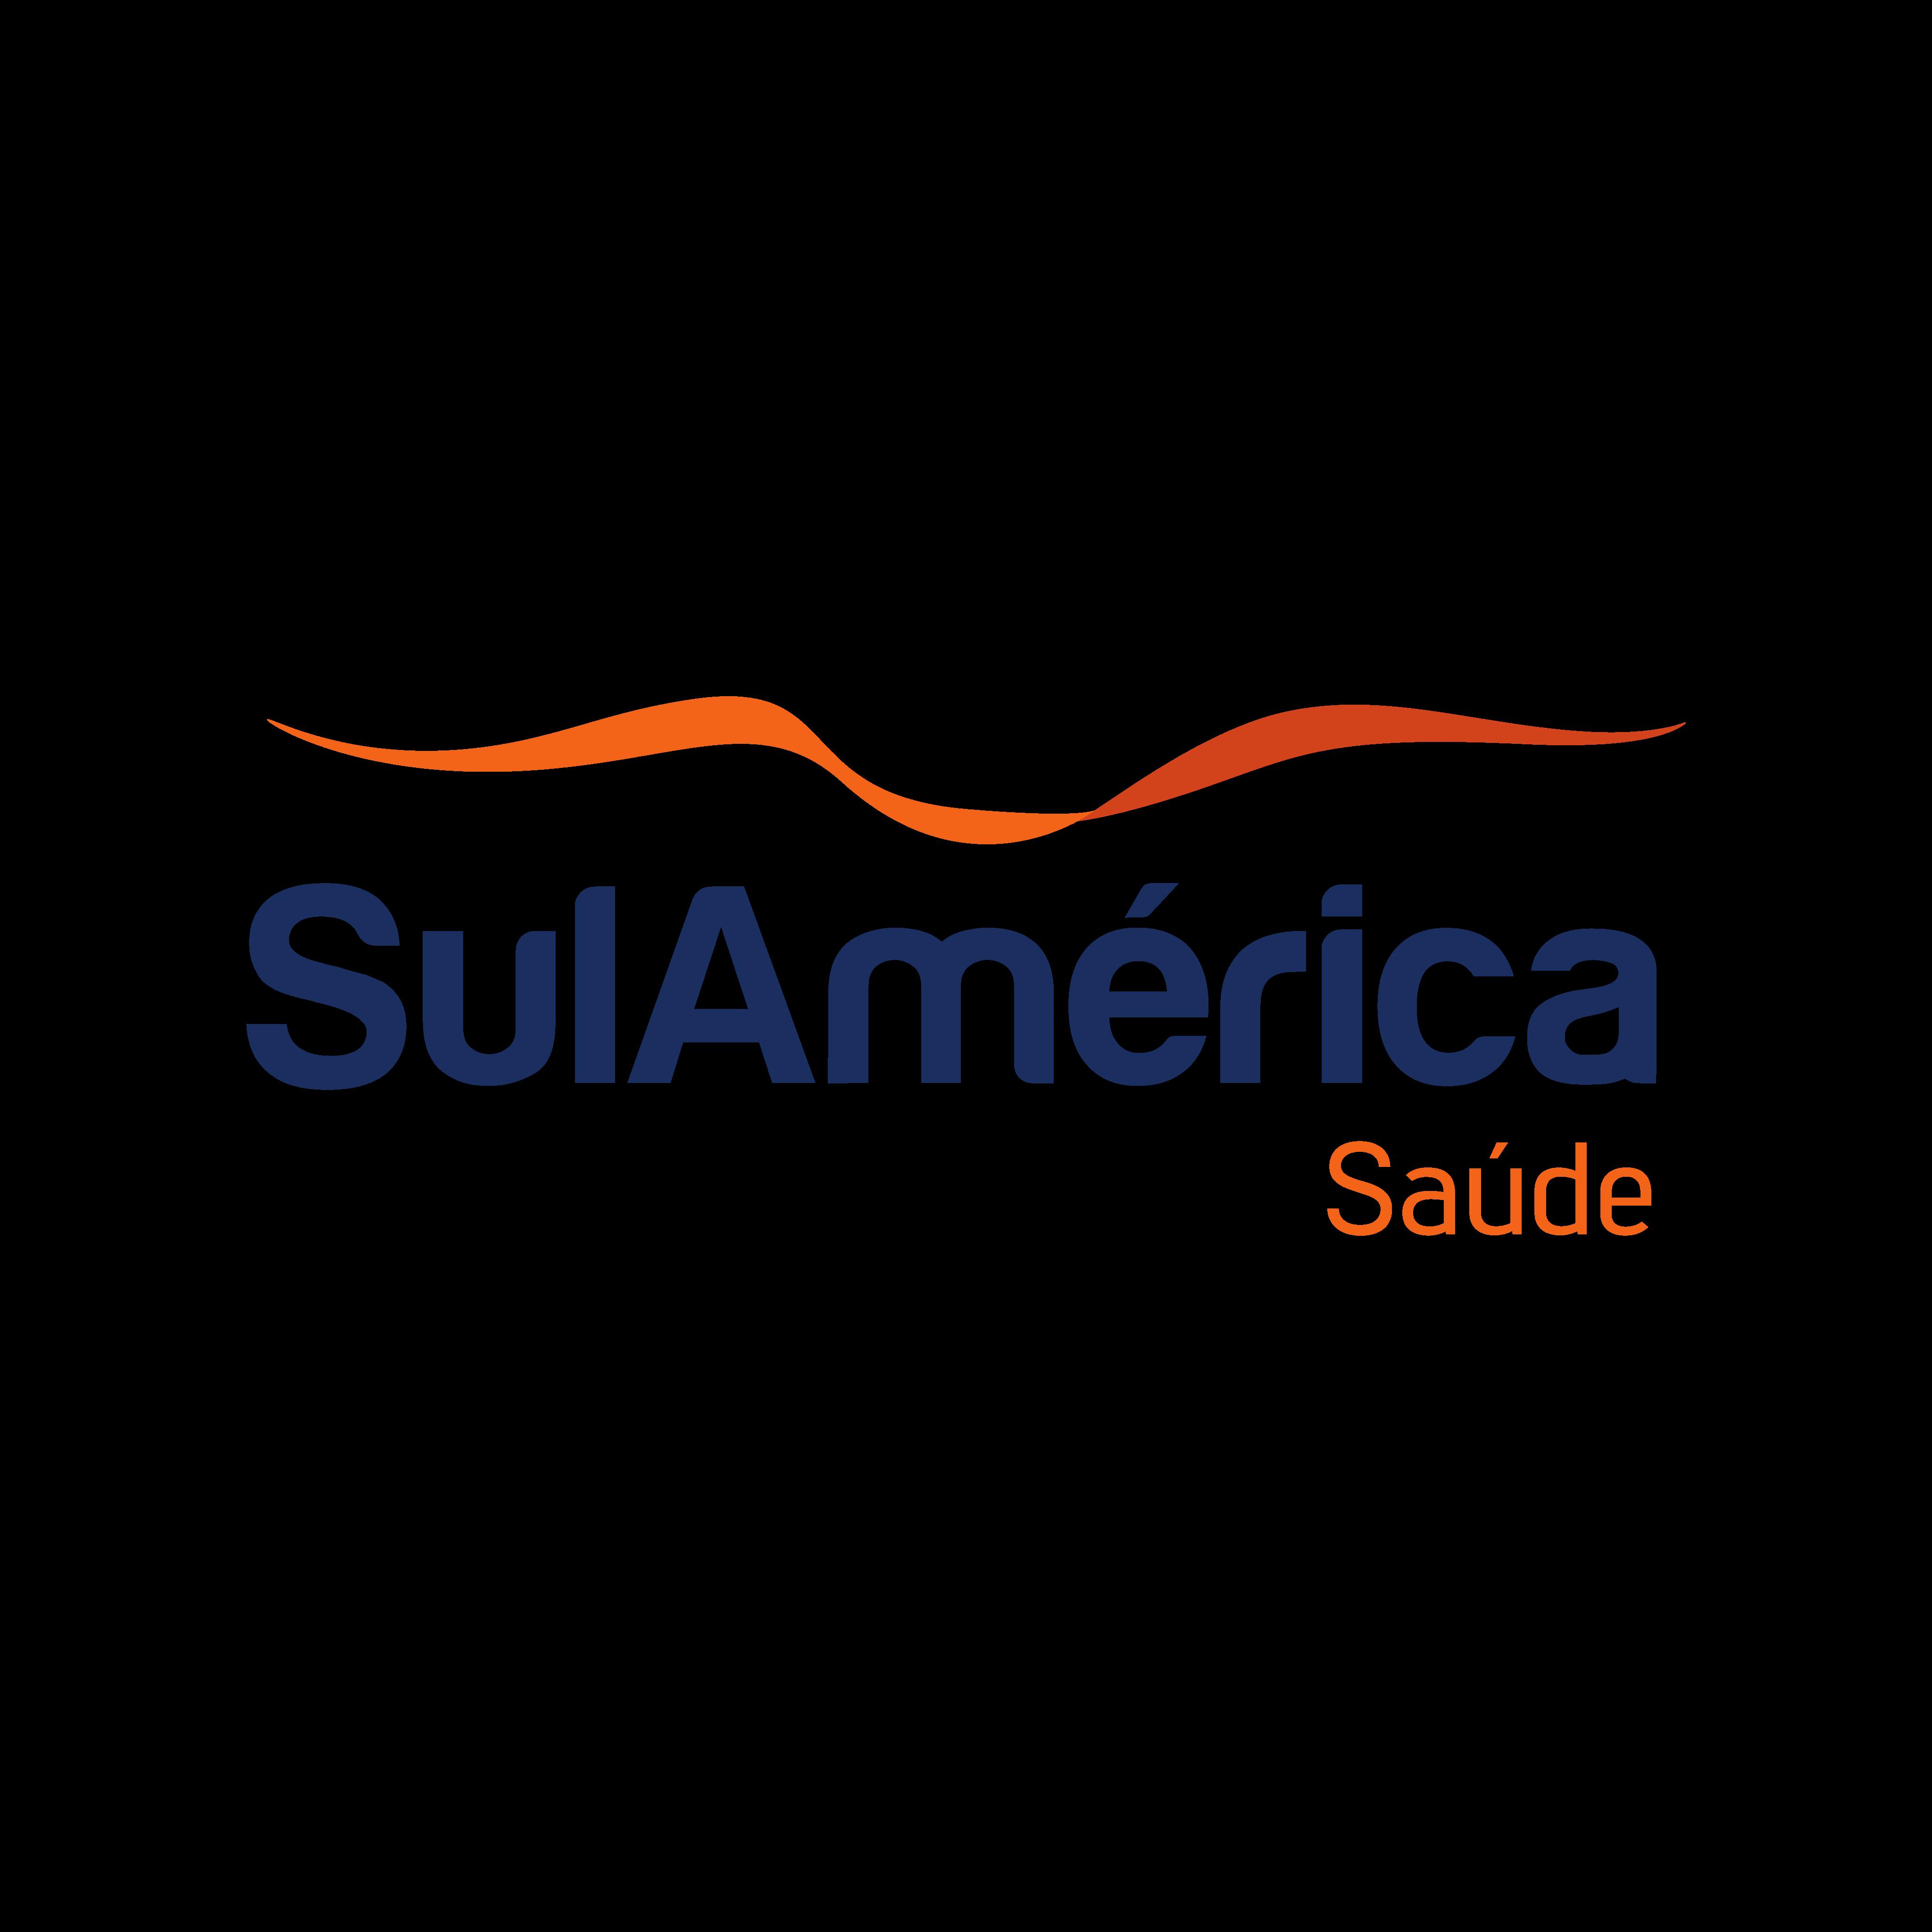 sulamerica saude logo 0 - SulAmérica Saúde Logo